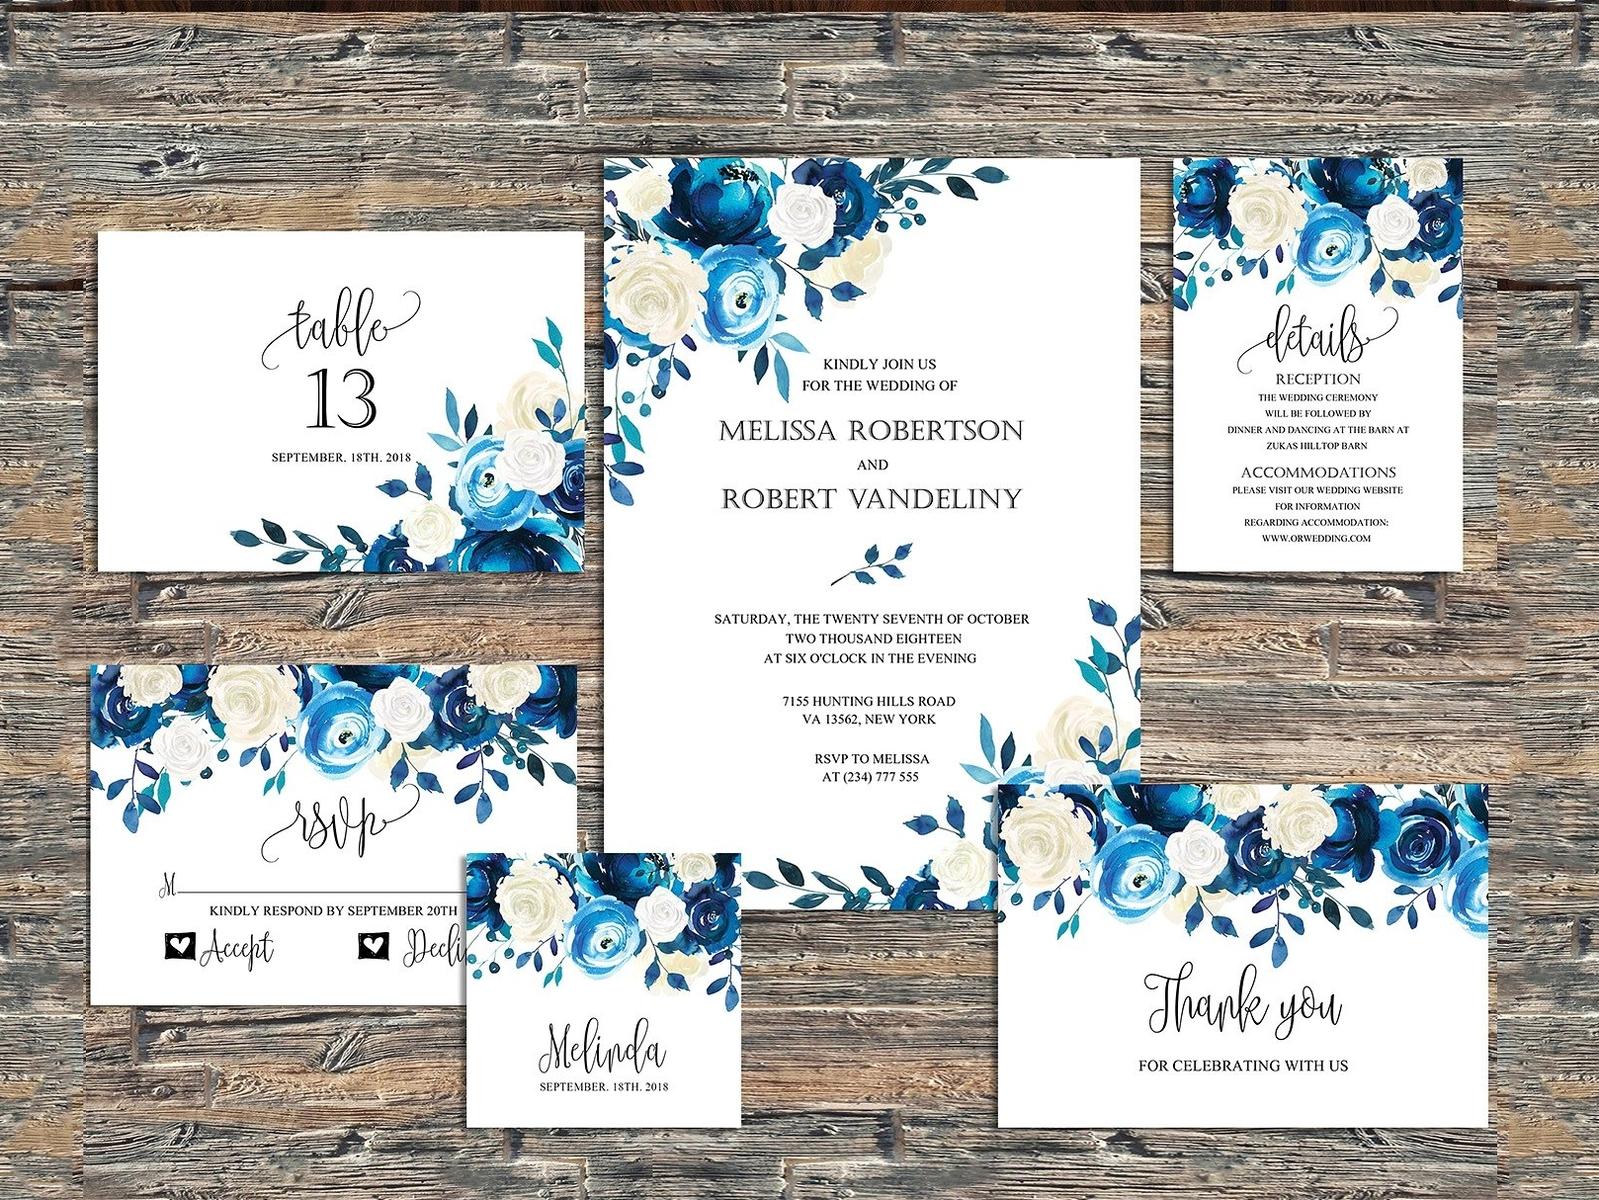 Navy Wedding Invitation Blue Roses by Invitations - Dribbble